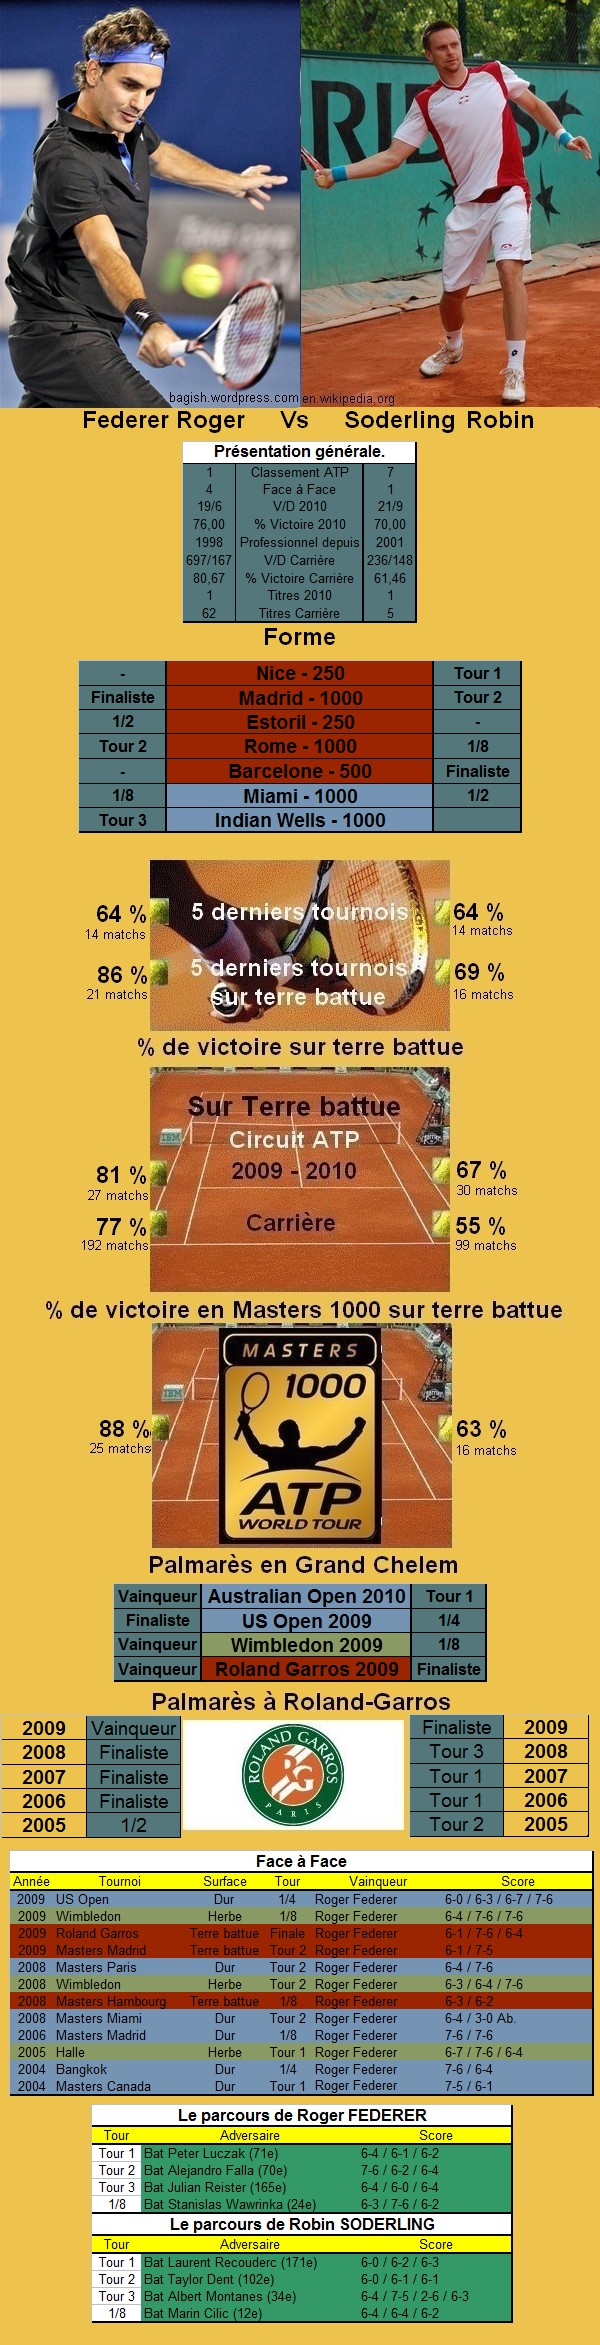 Statistiques tennis de Federer contre Soderling à Roland Garros